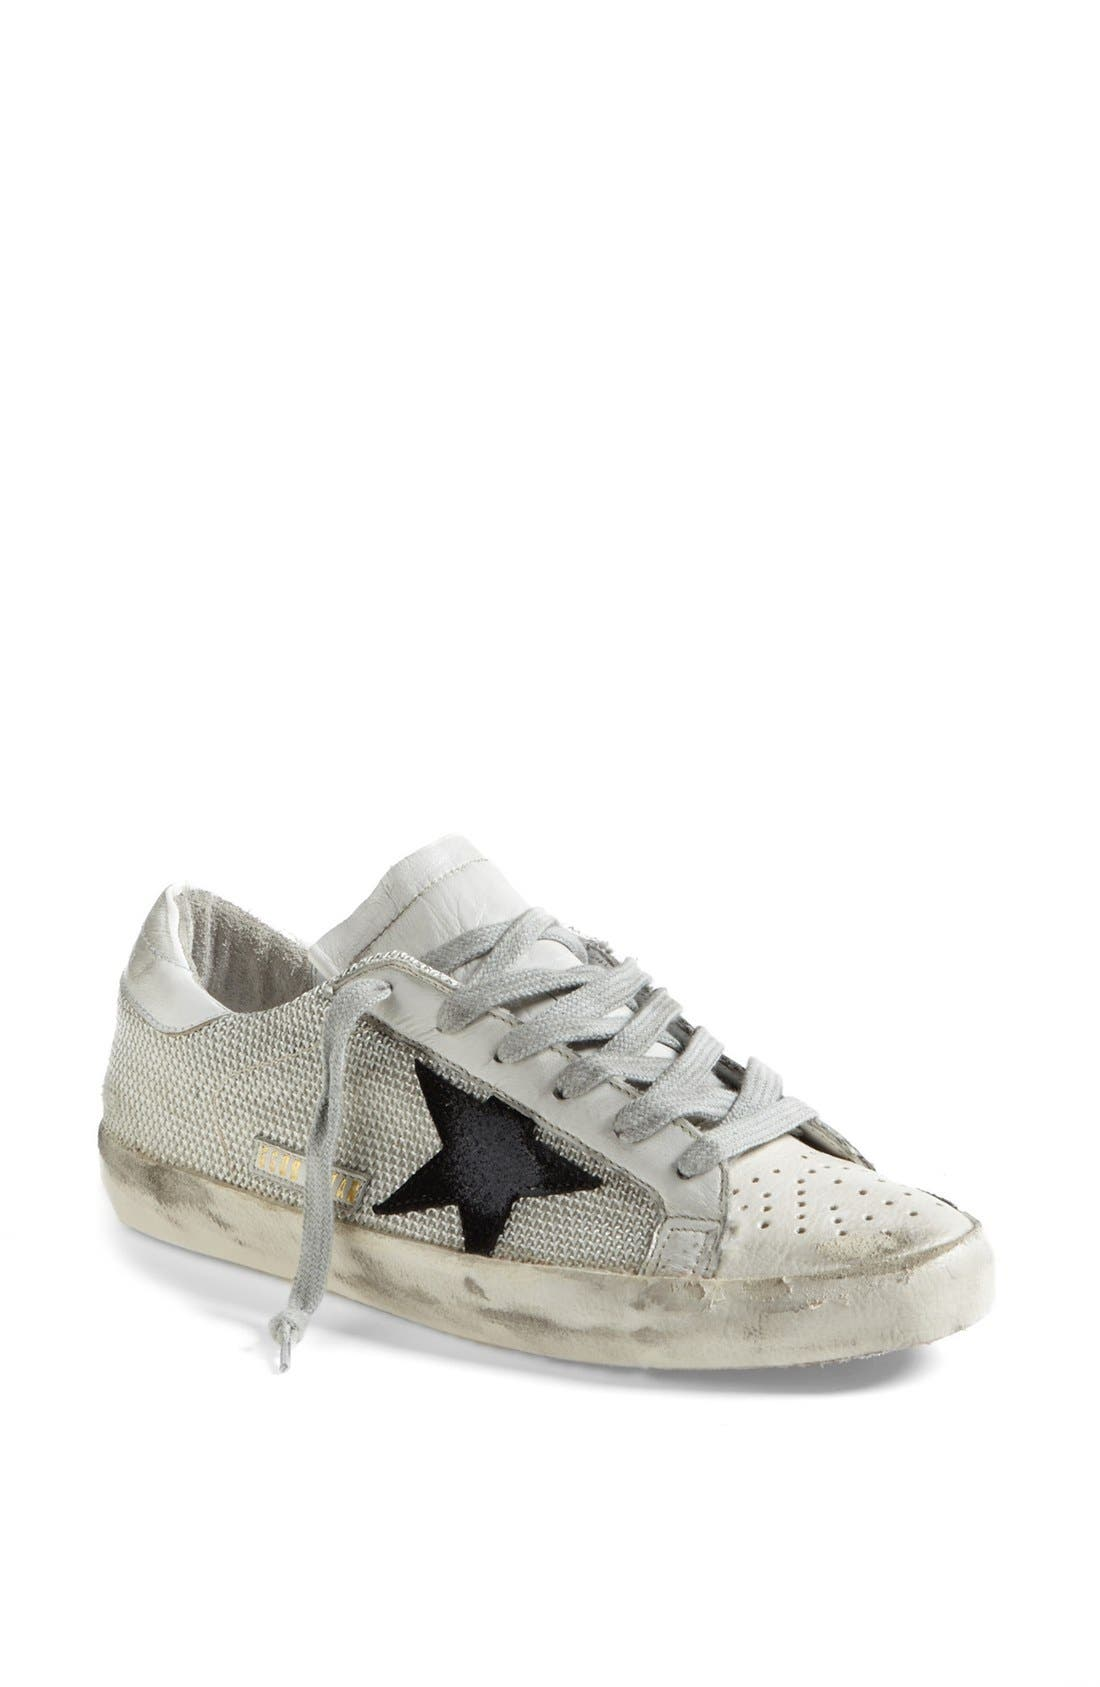 Main Image - Golden Goose 'Superstar' Sneaker